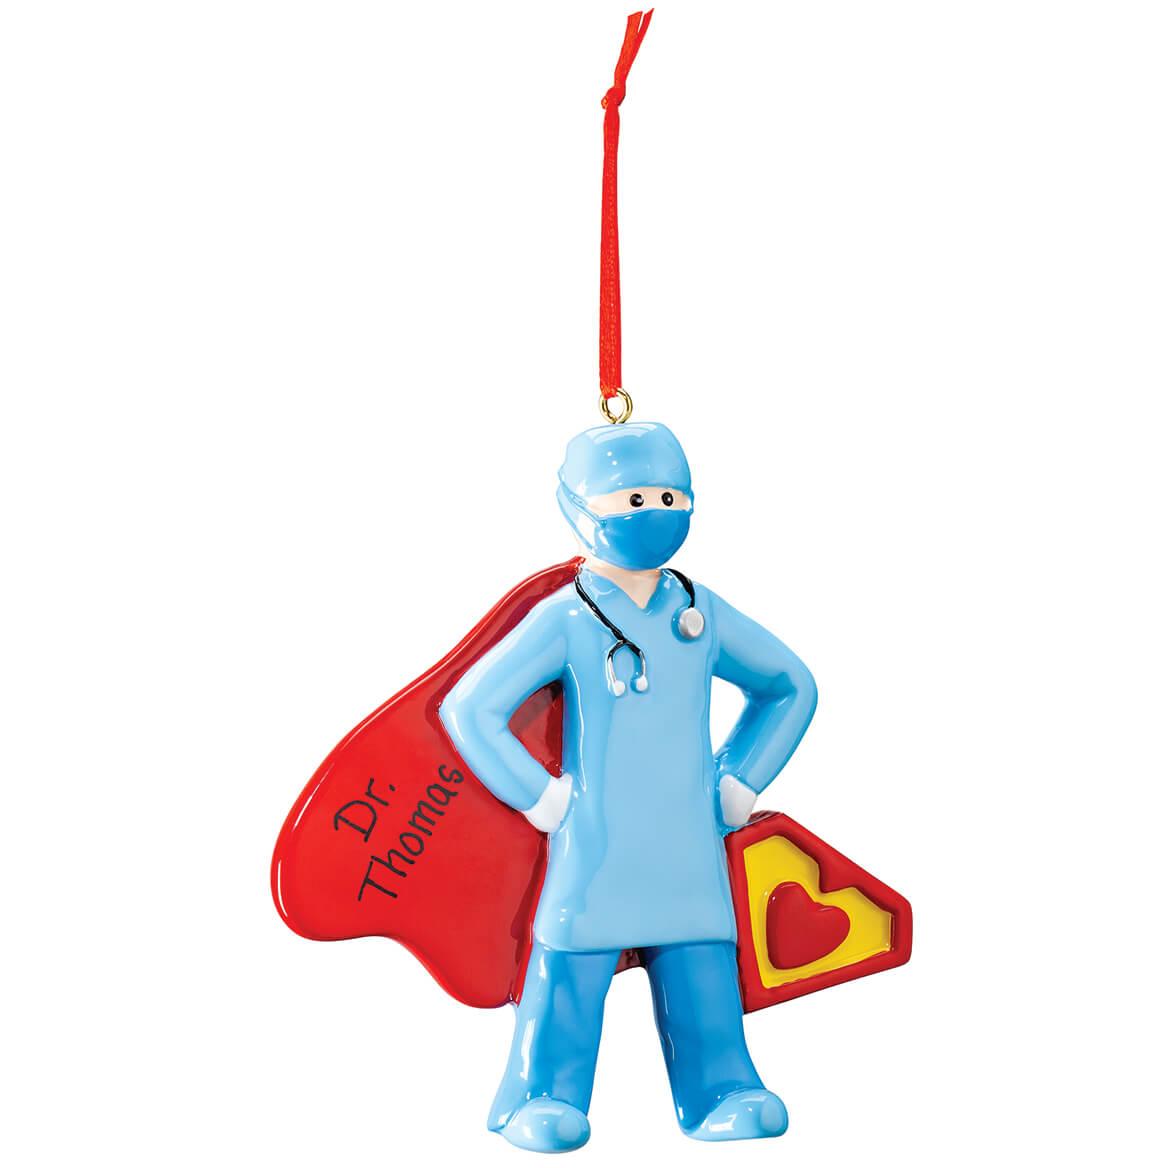 Personalized Super Doctor Ornament-371640